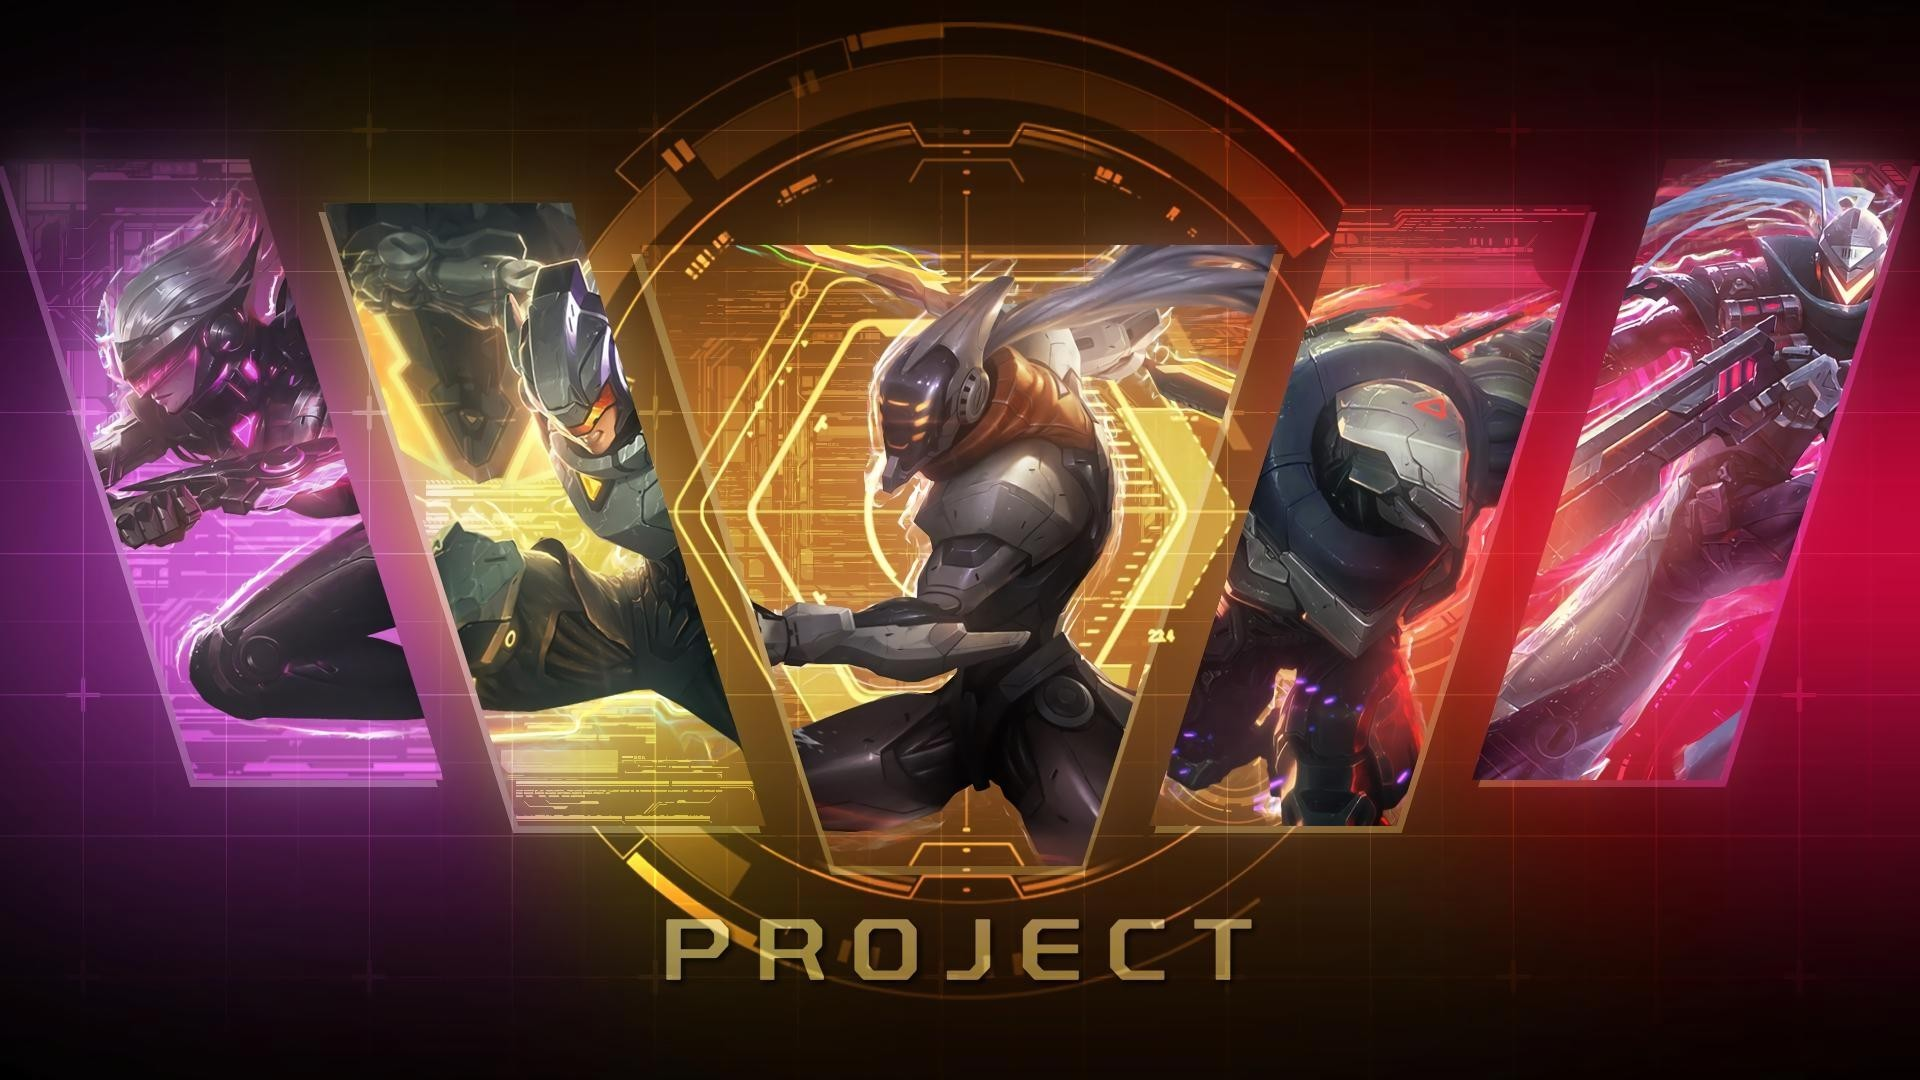 #League of Legends, #Project Skin   Wallpaper No. 258494 .